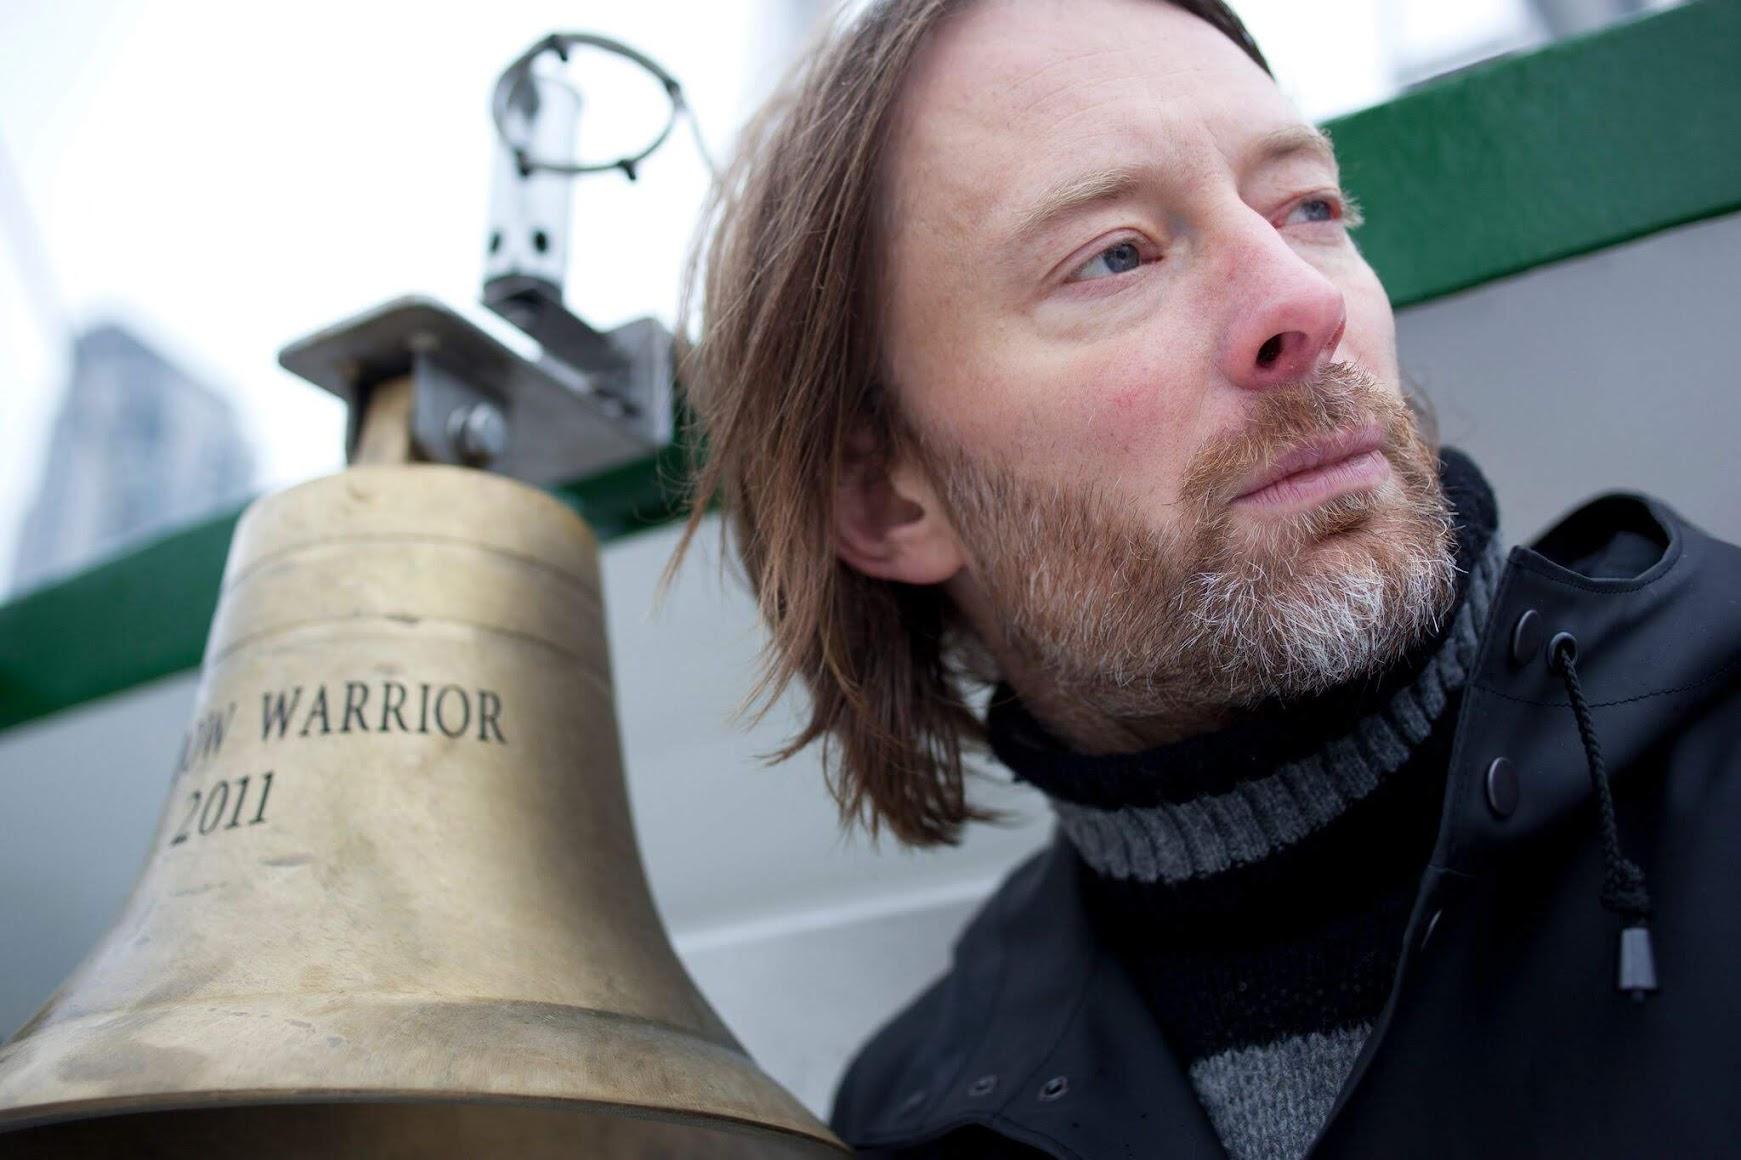 湯姆約克 Thom Yorke